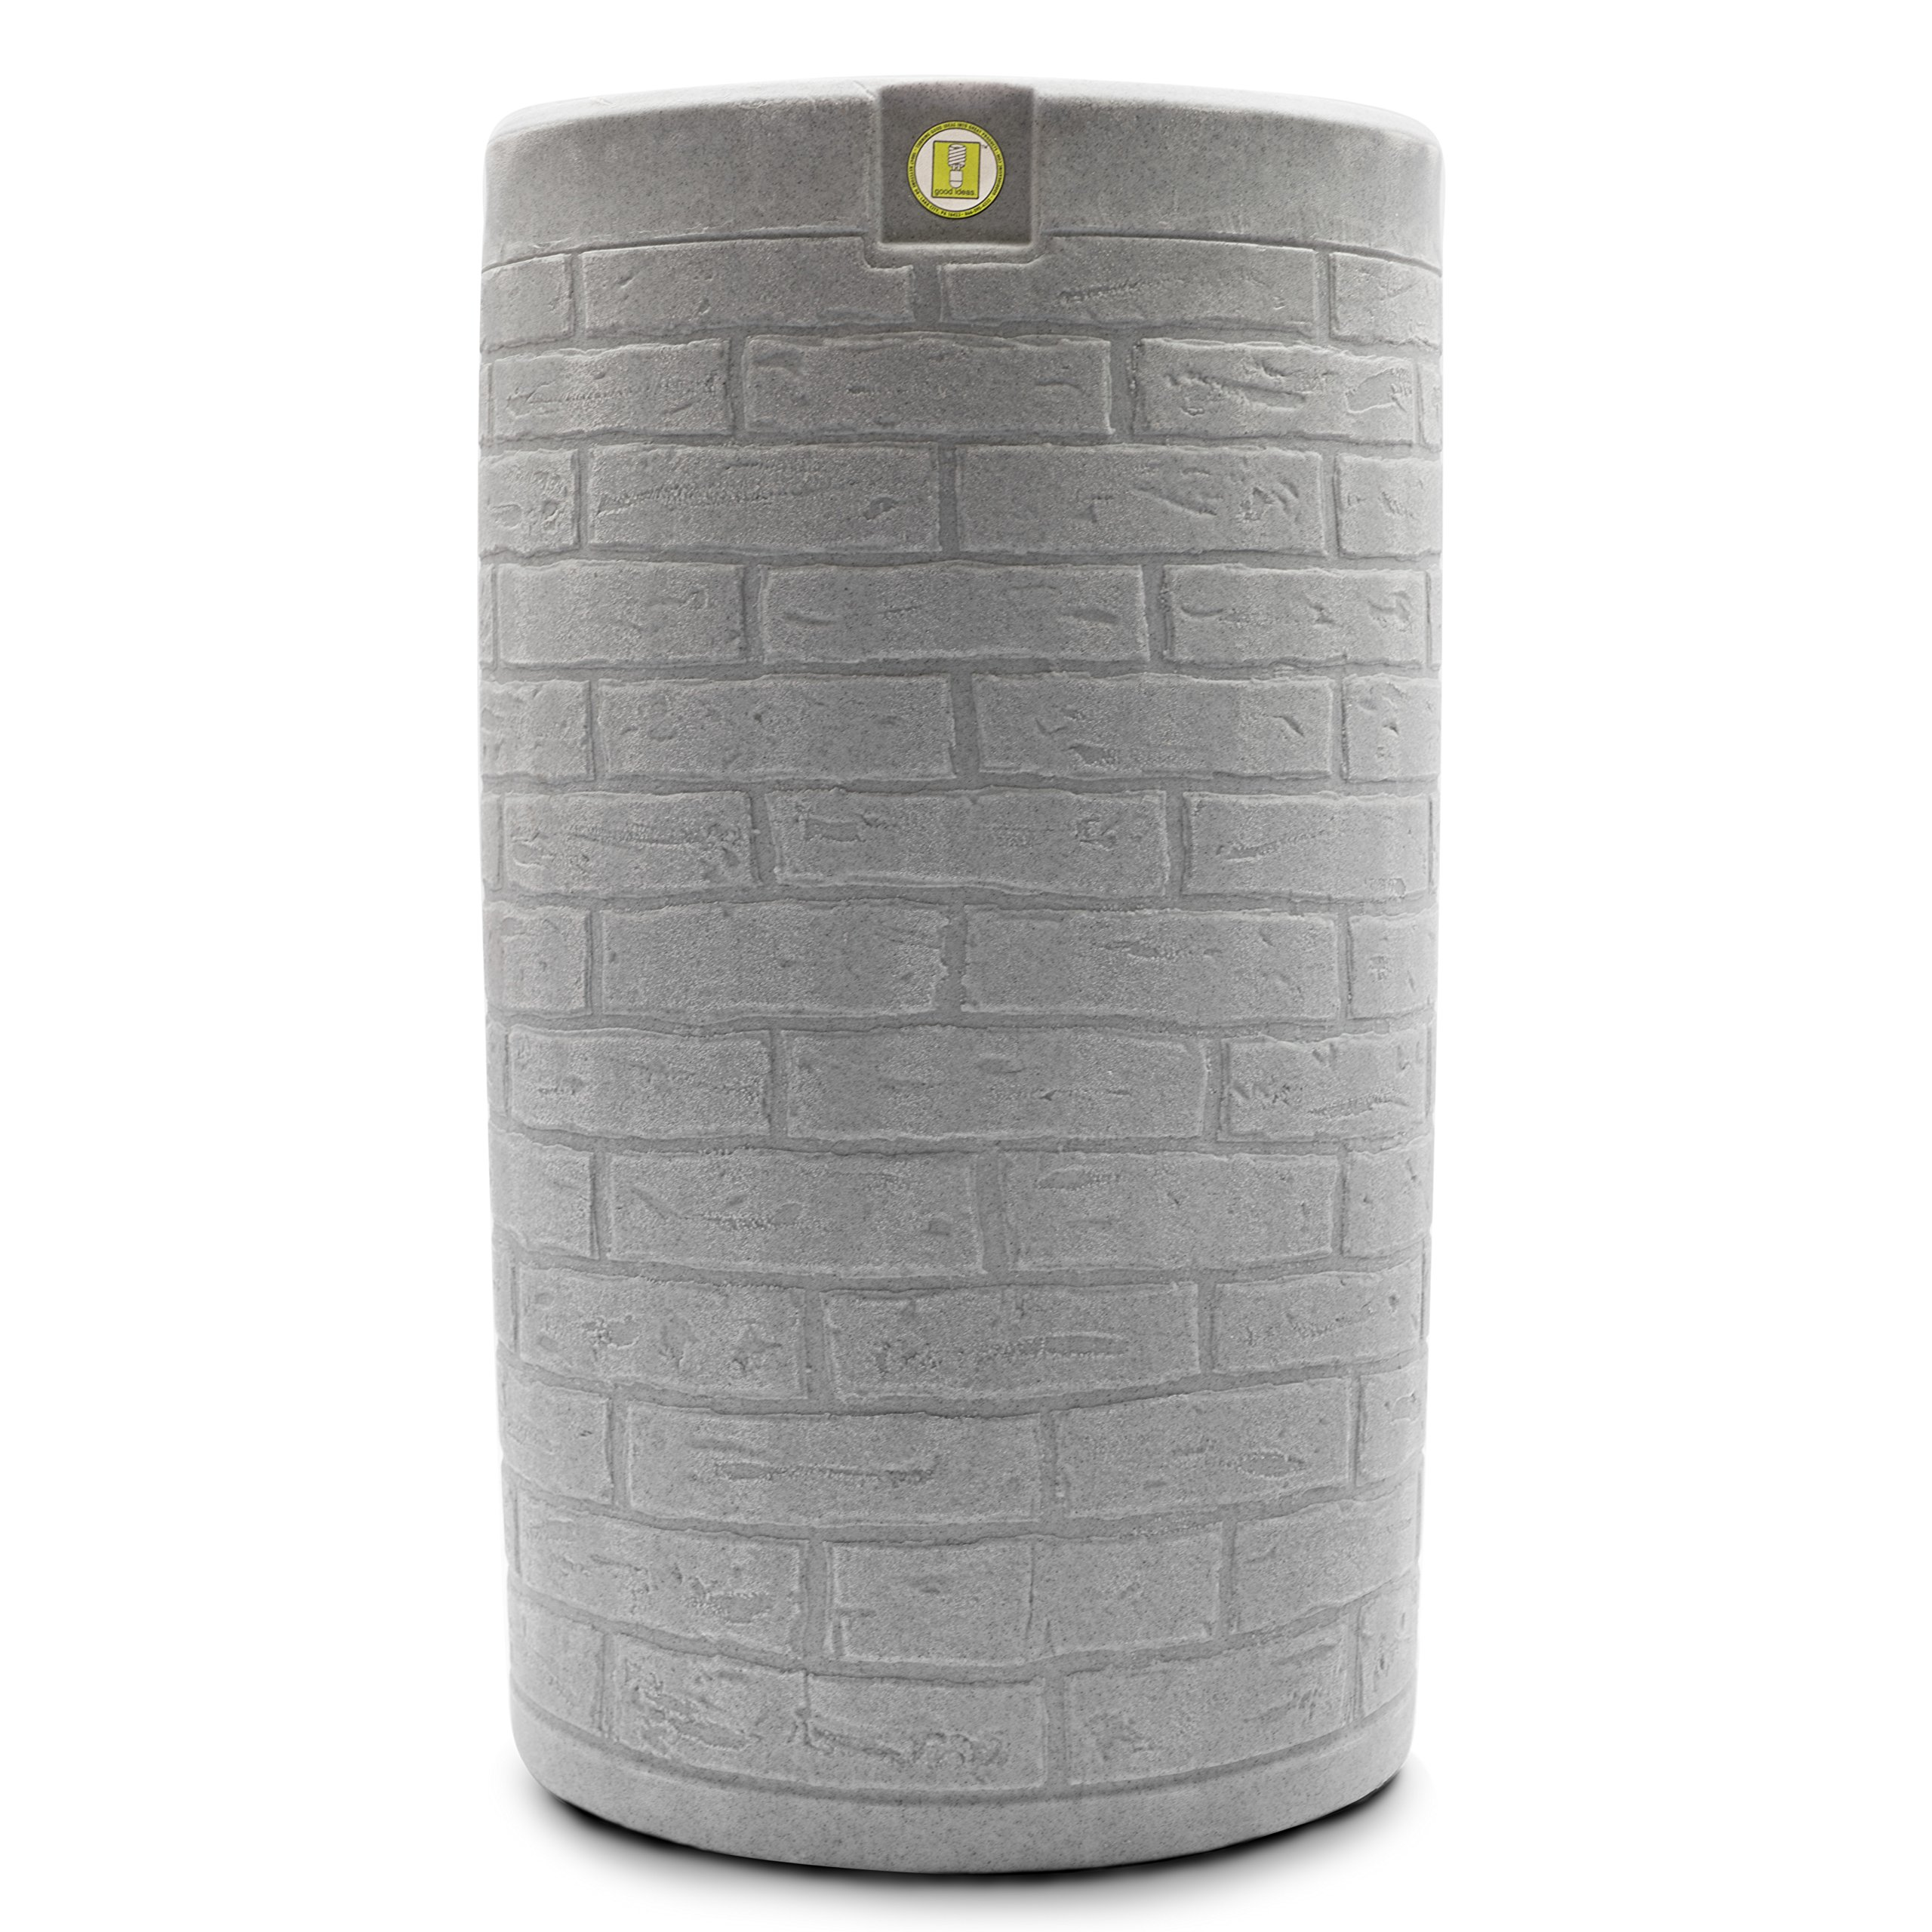 Good Ideas IMP-D50-LIG Impressions Downton Rain Saver Rain Barrel, 50 gallon, Light Granite by Good Ideas